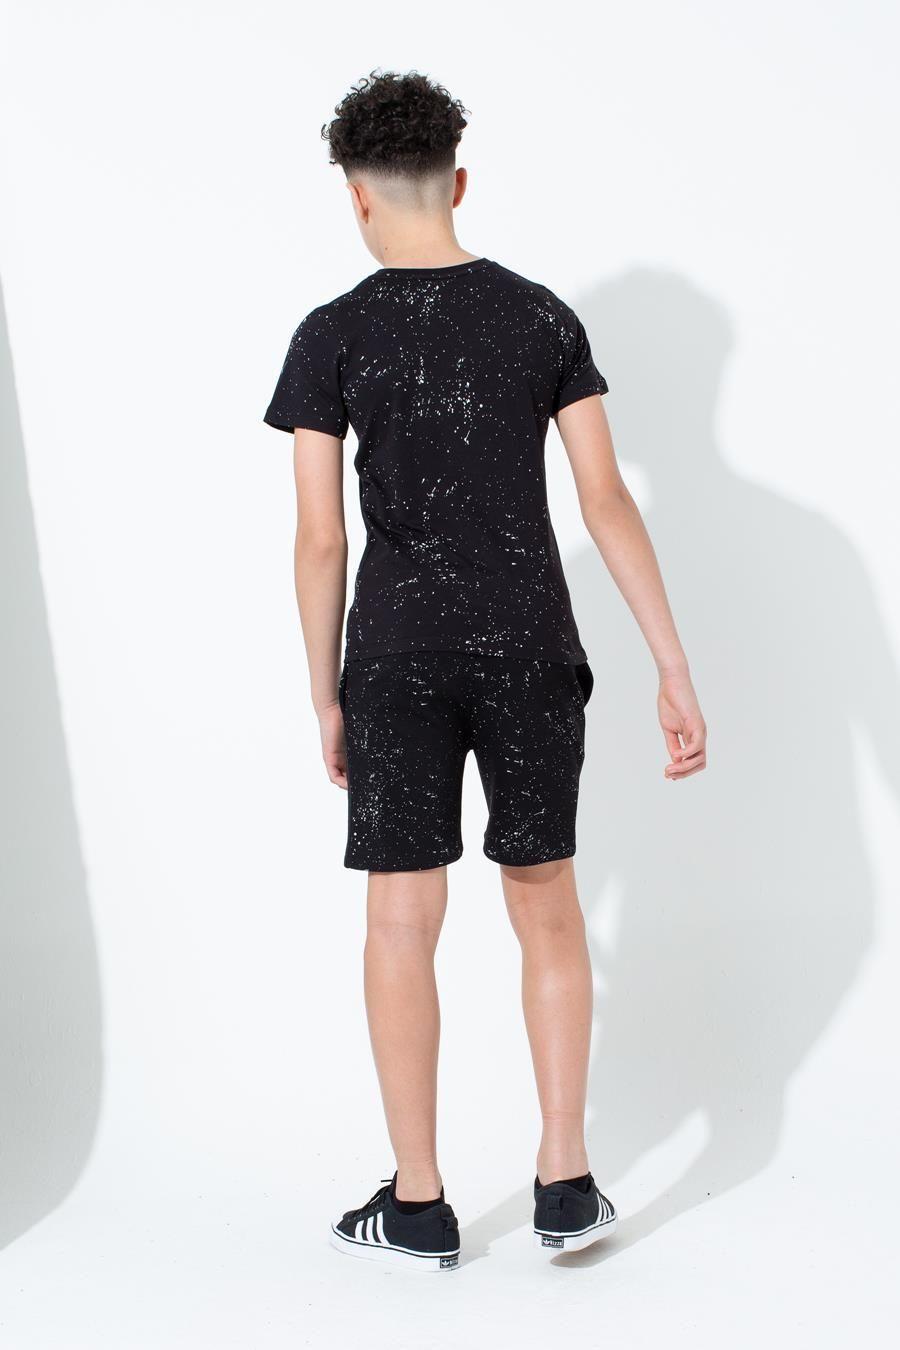 Hype Black Aop Speckle Kids Shorts